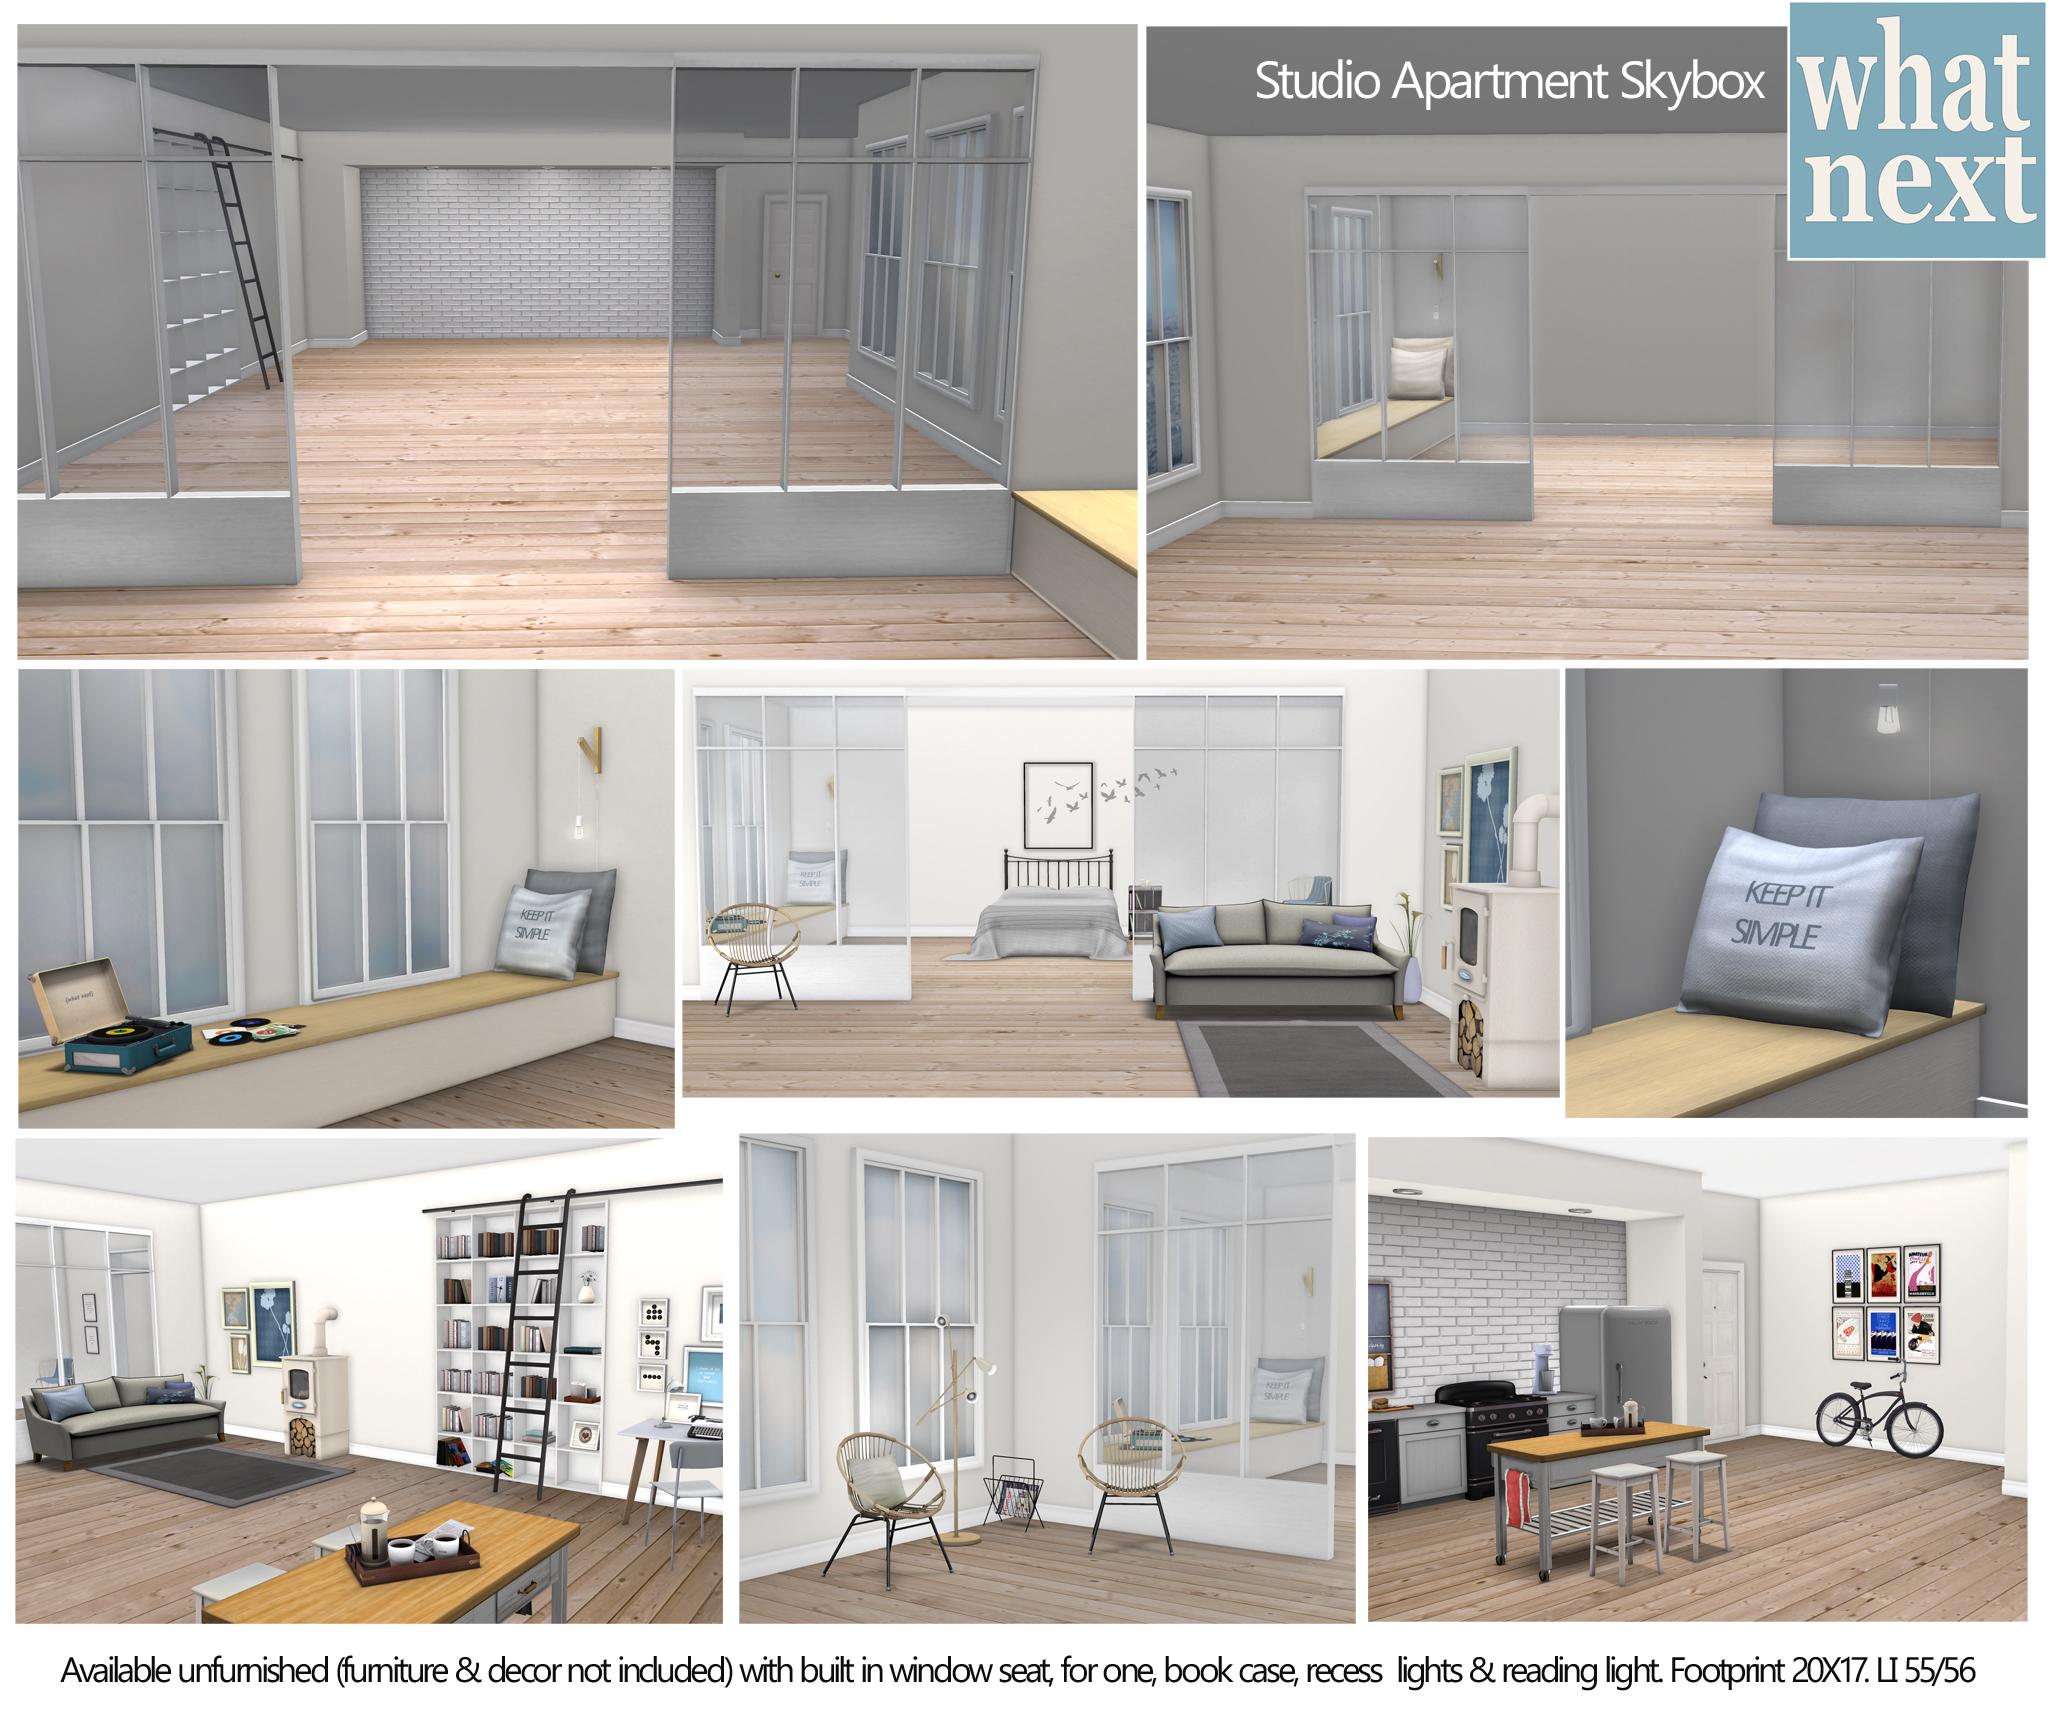 Studio Apartment Skybox